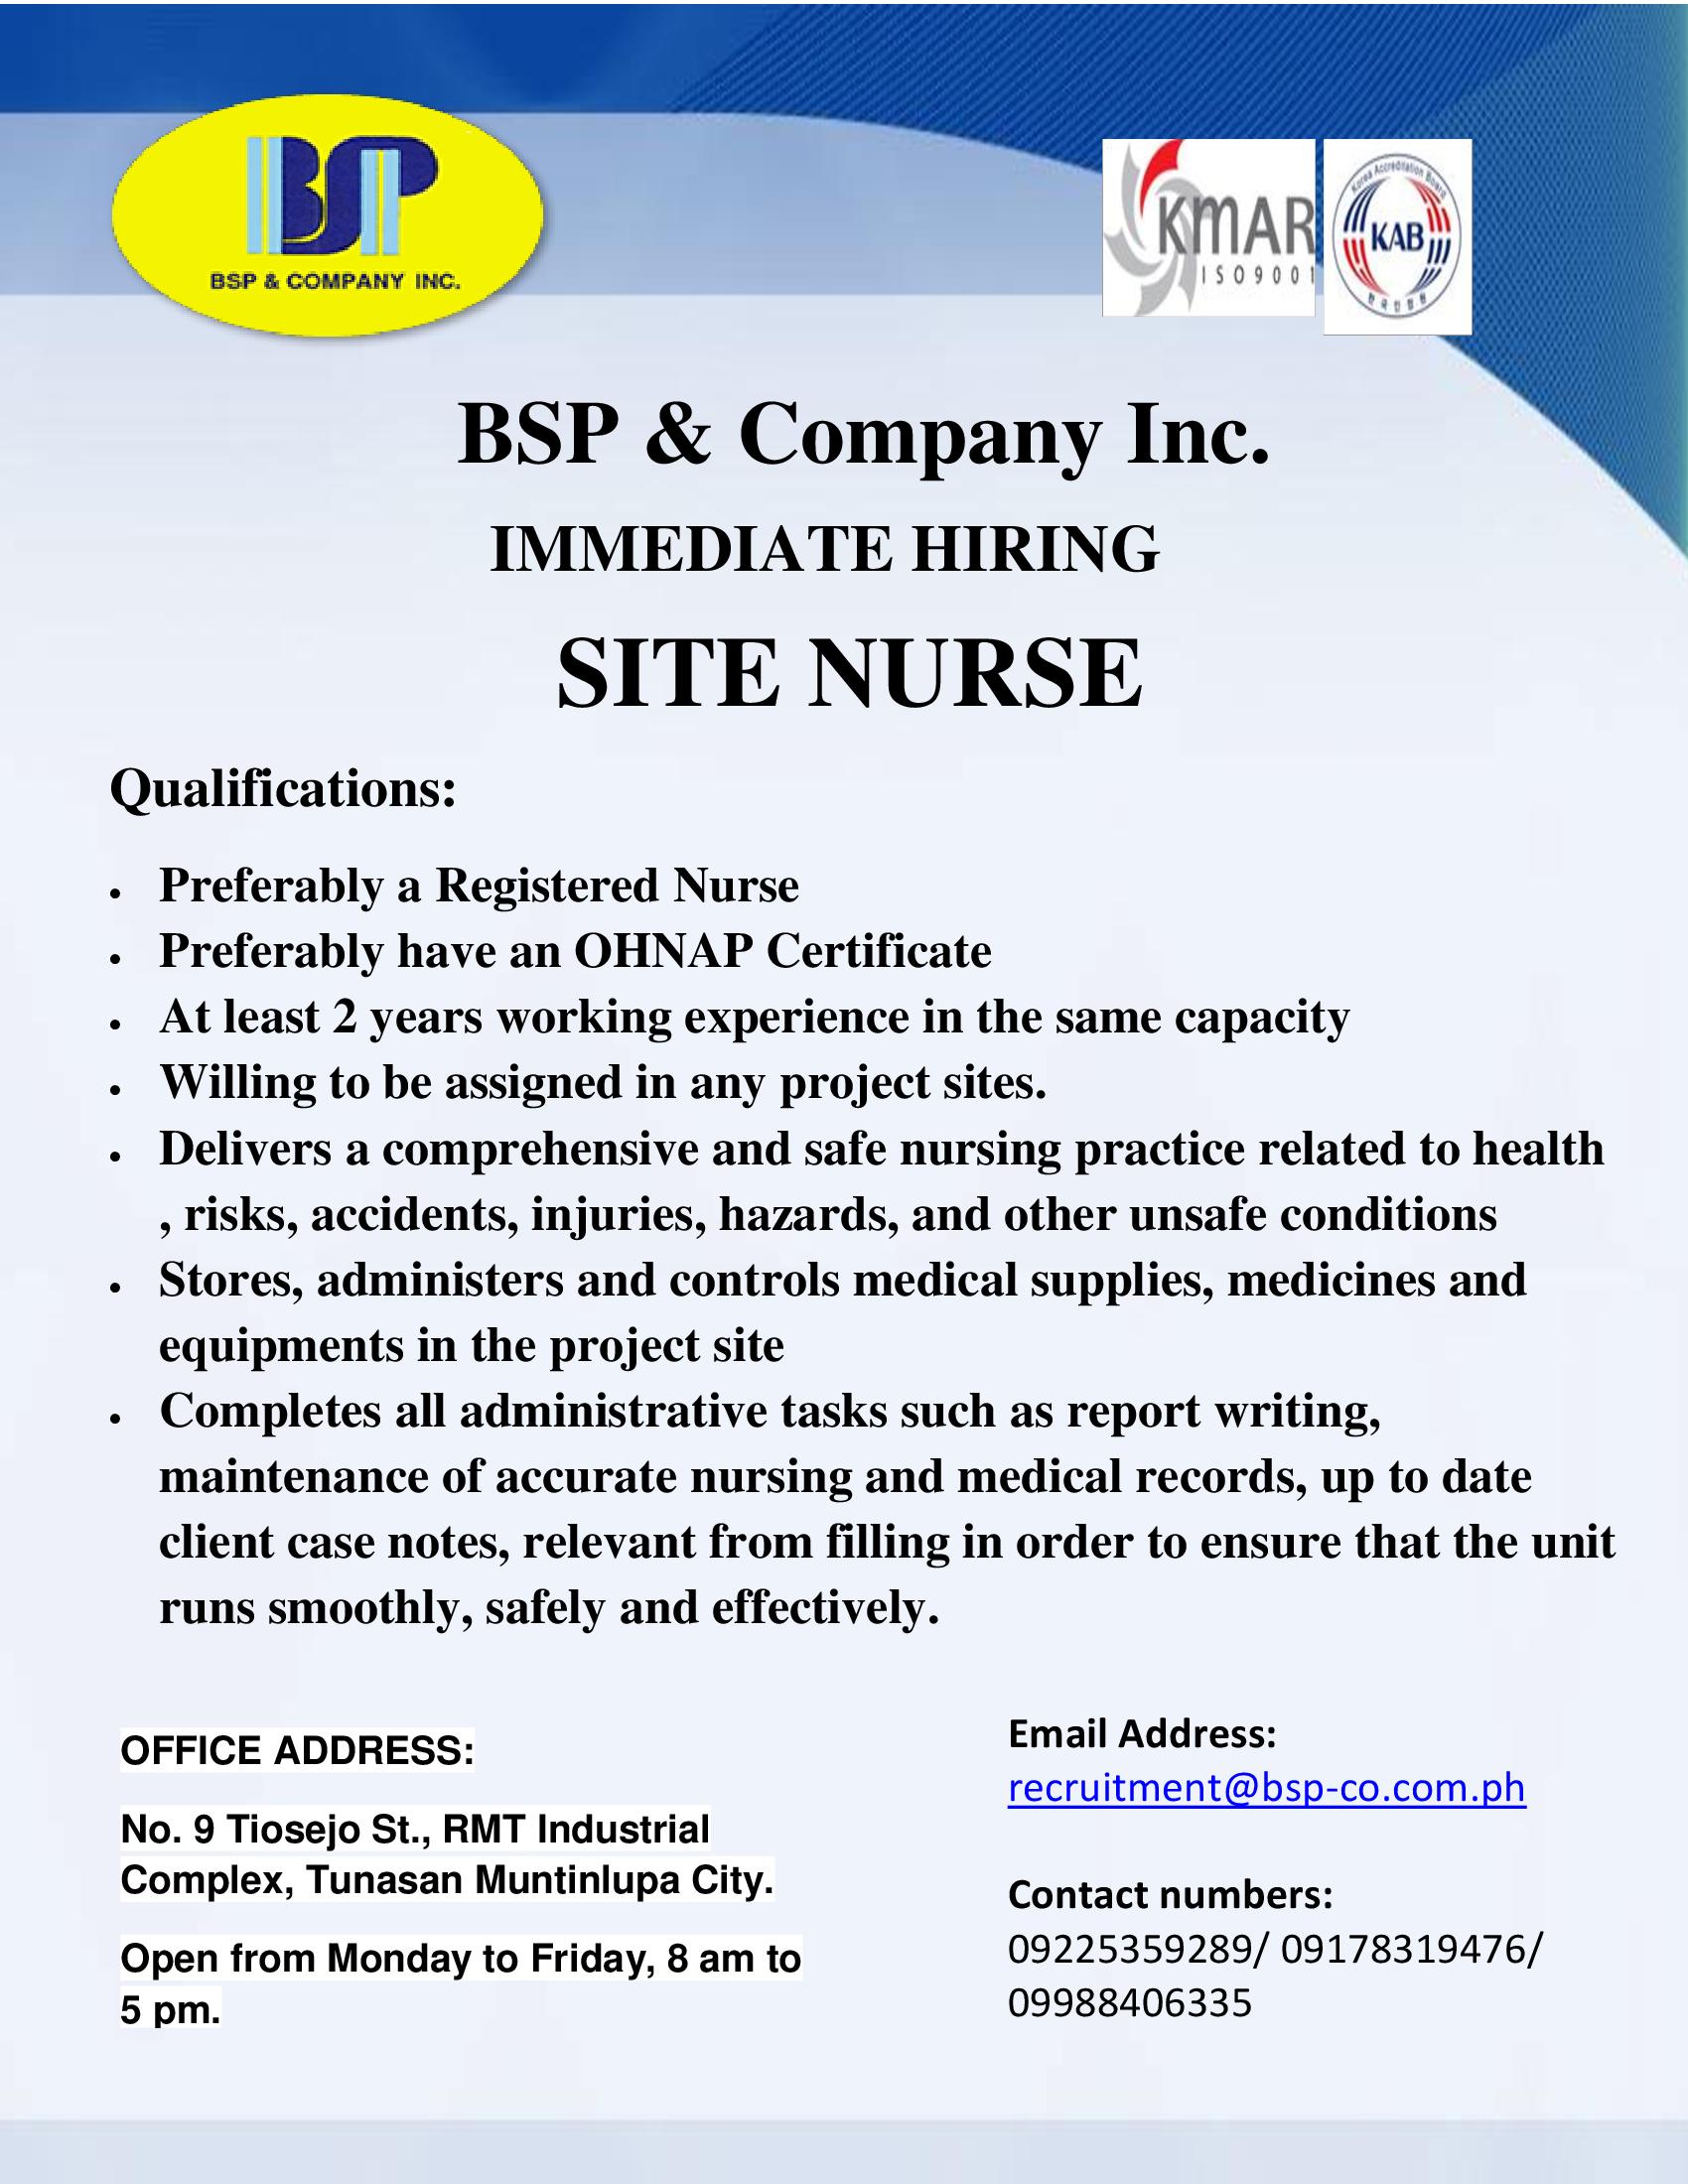 Site Nurse from BSP & Company Inc.